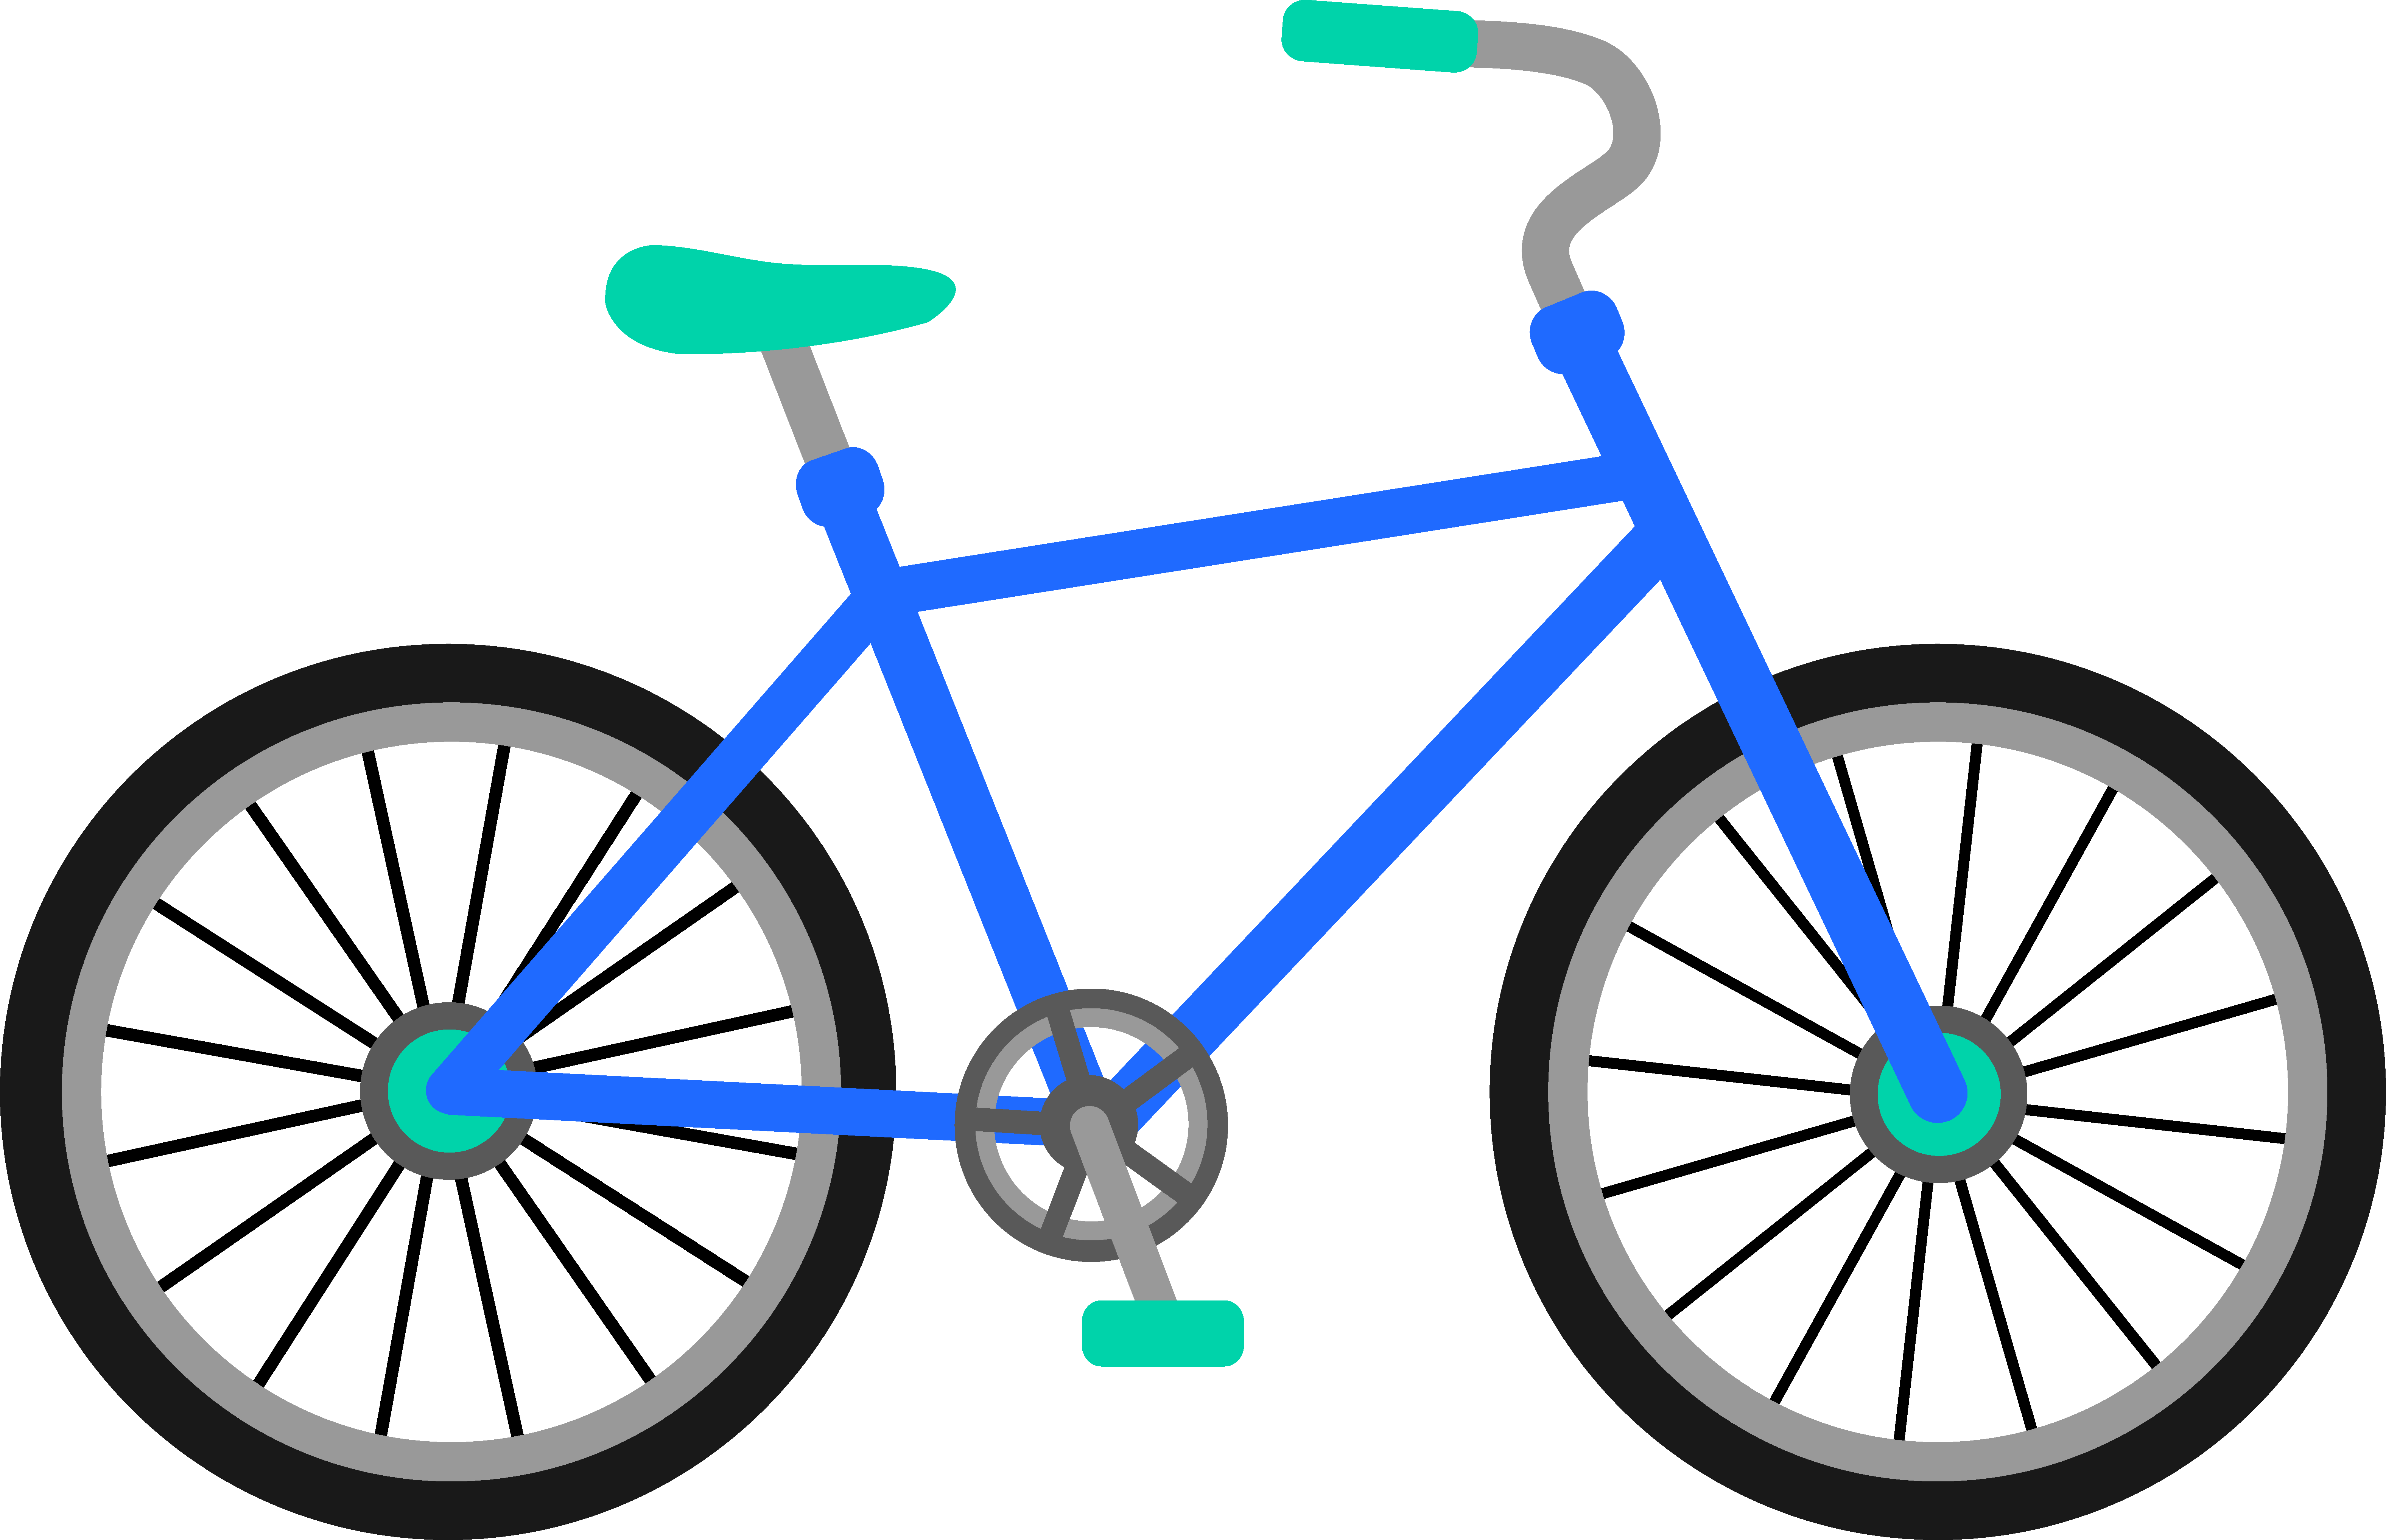 Clip Art: Transportation Bicycle Drawing Clip art.